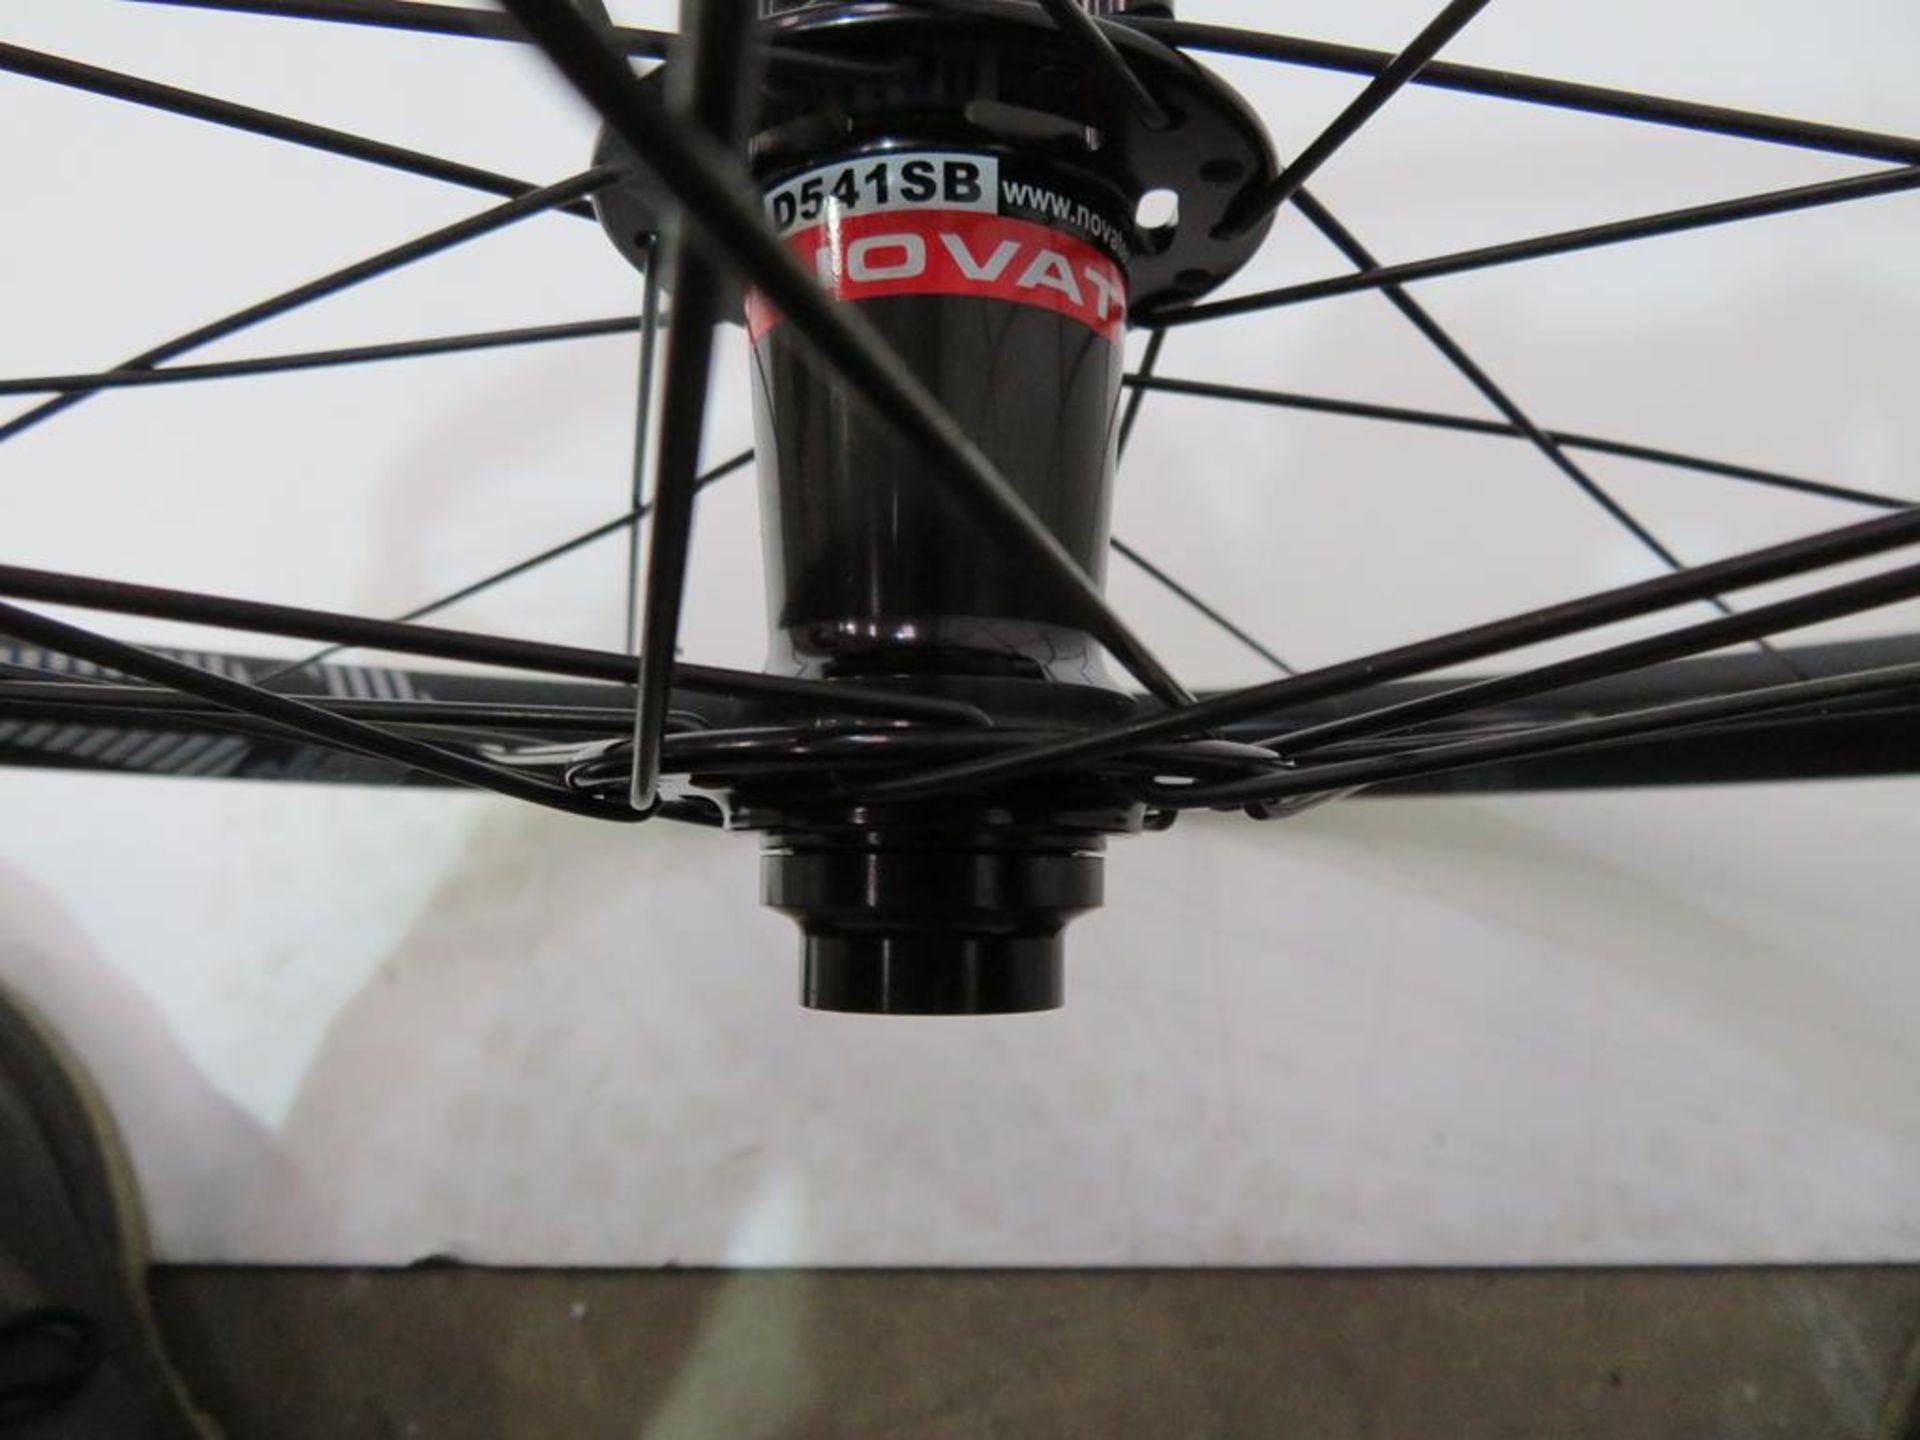 Lot 12 - E*Thirteen LG1+ Wheel Set with Novatec DH42SB Hubs